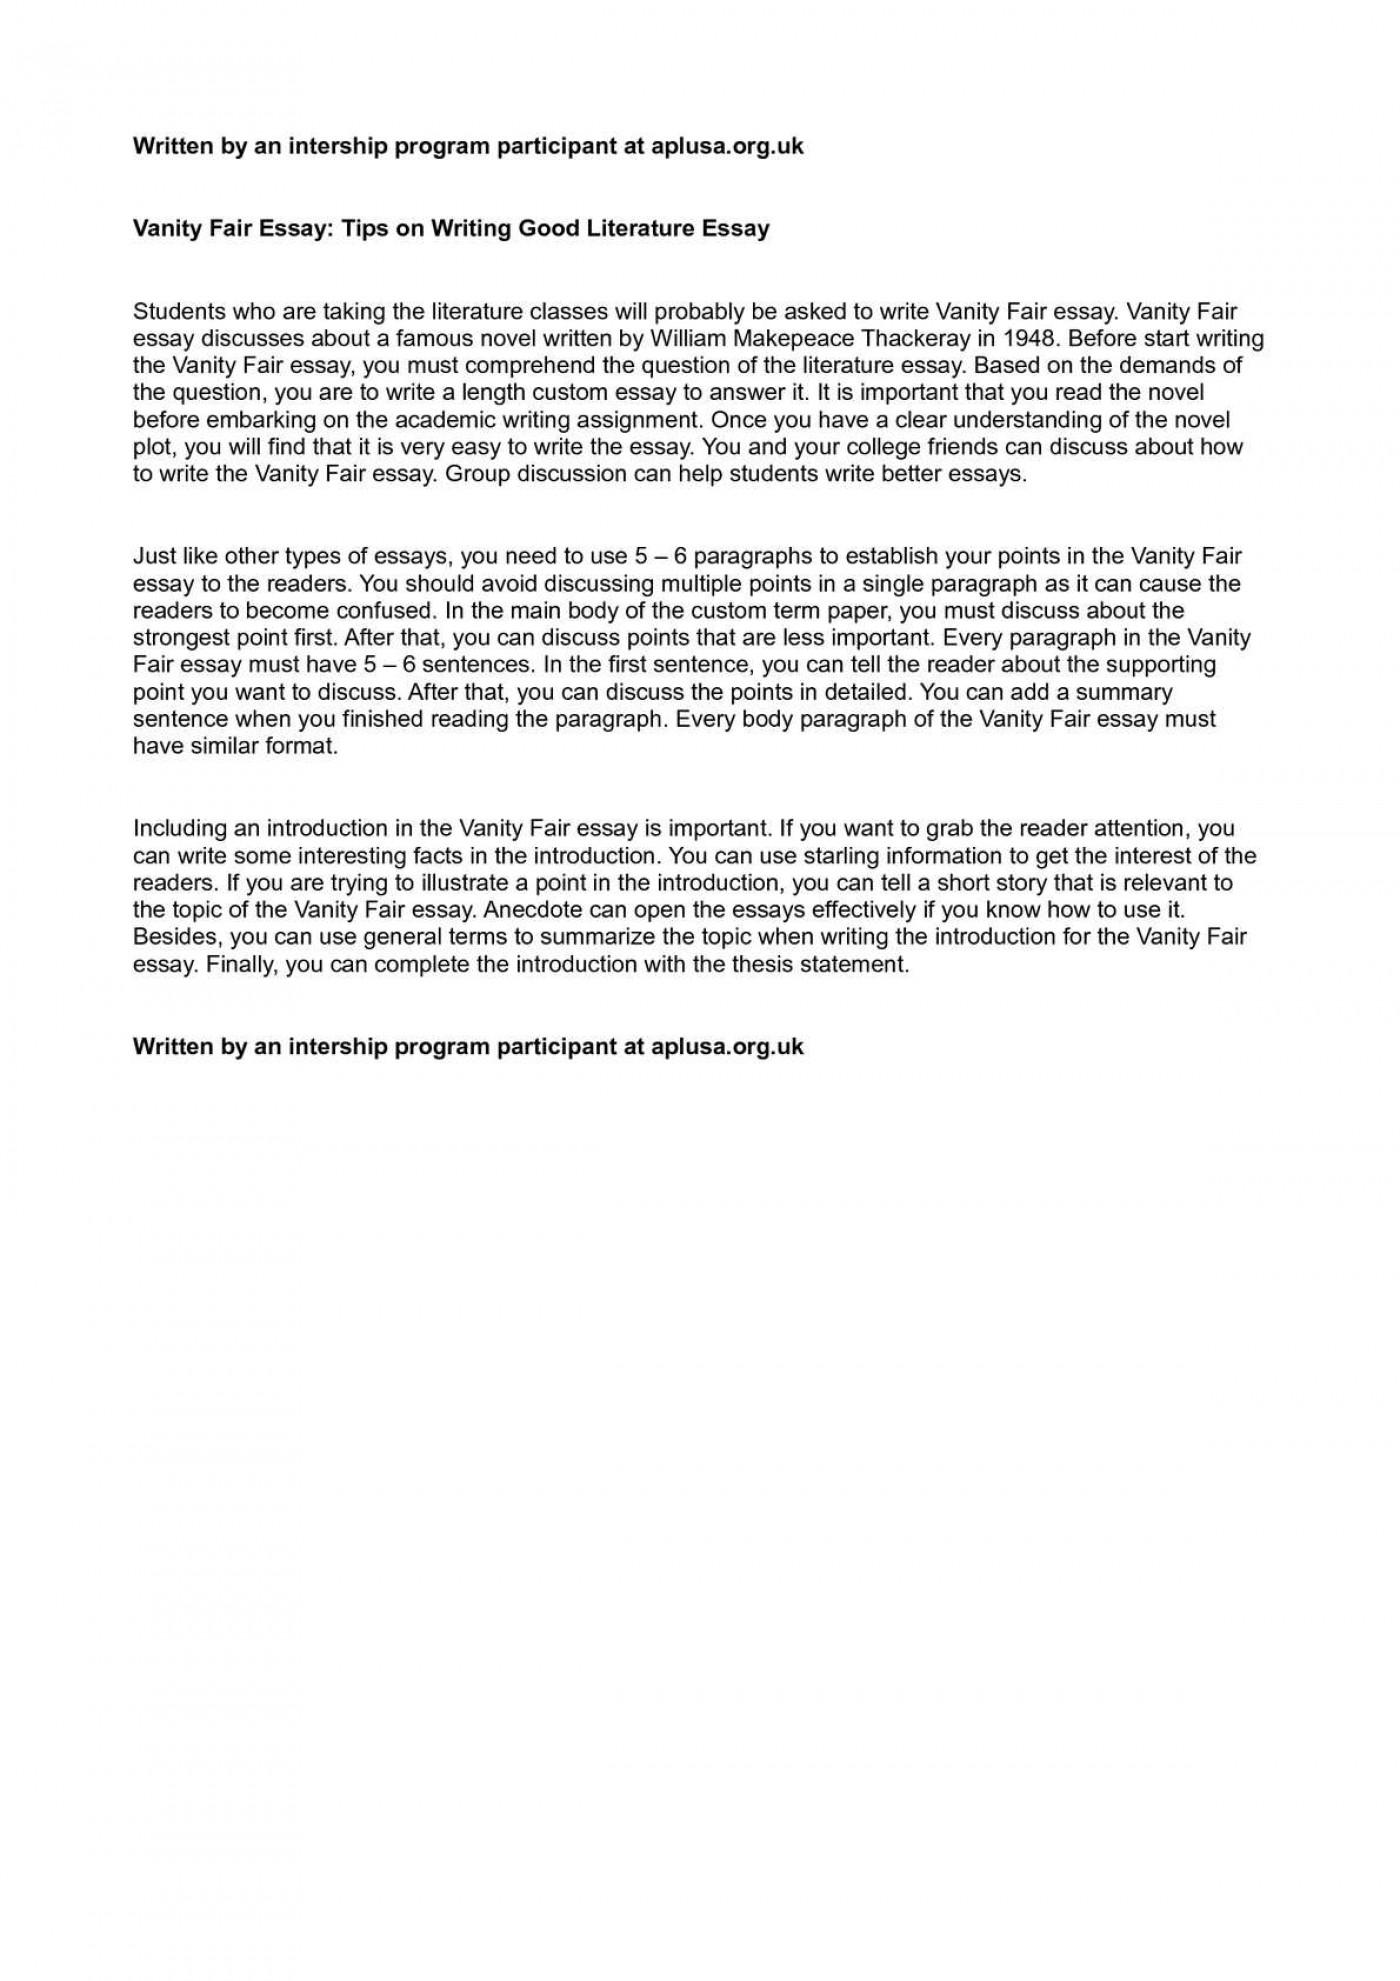 003 Essay Example P1 On Stupendous Vanity Definition Fair Montaigne's 1400